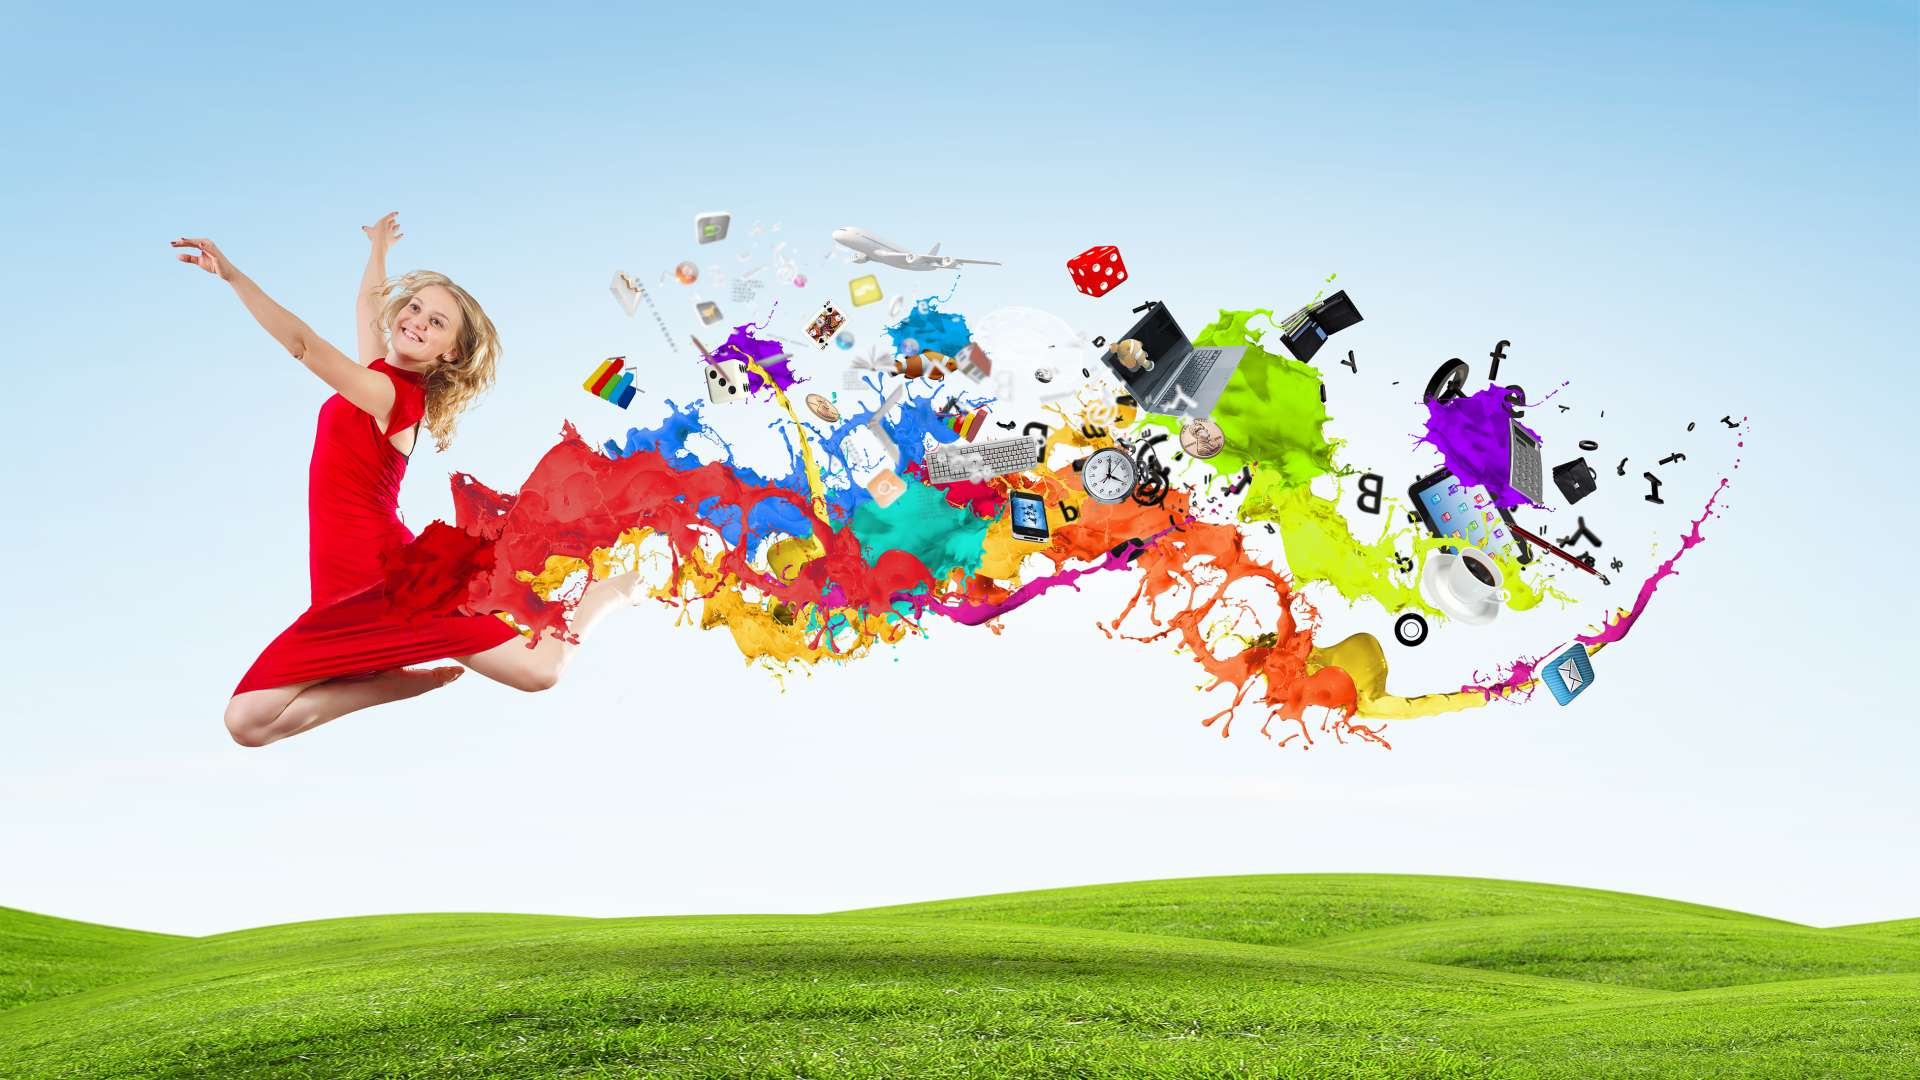 Pokoloruj swój biznes kolory Mediarun kolory 66887235 Subscription Monthly XL